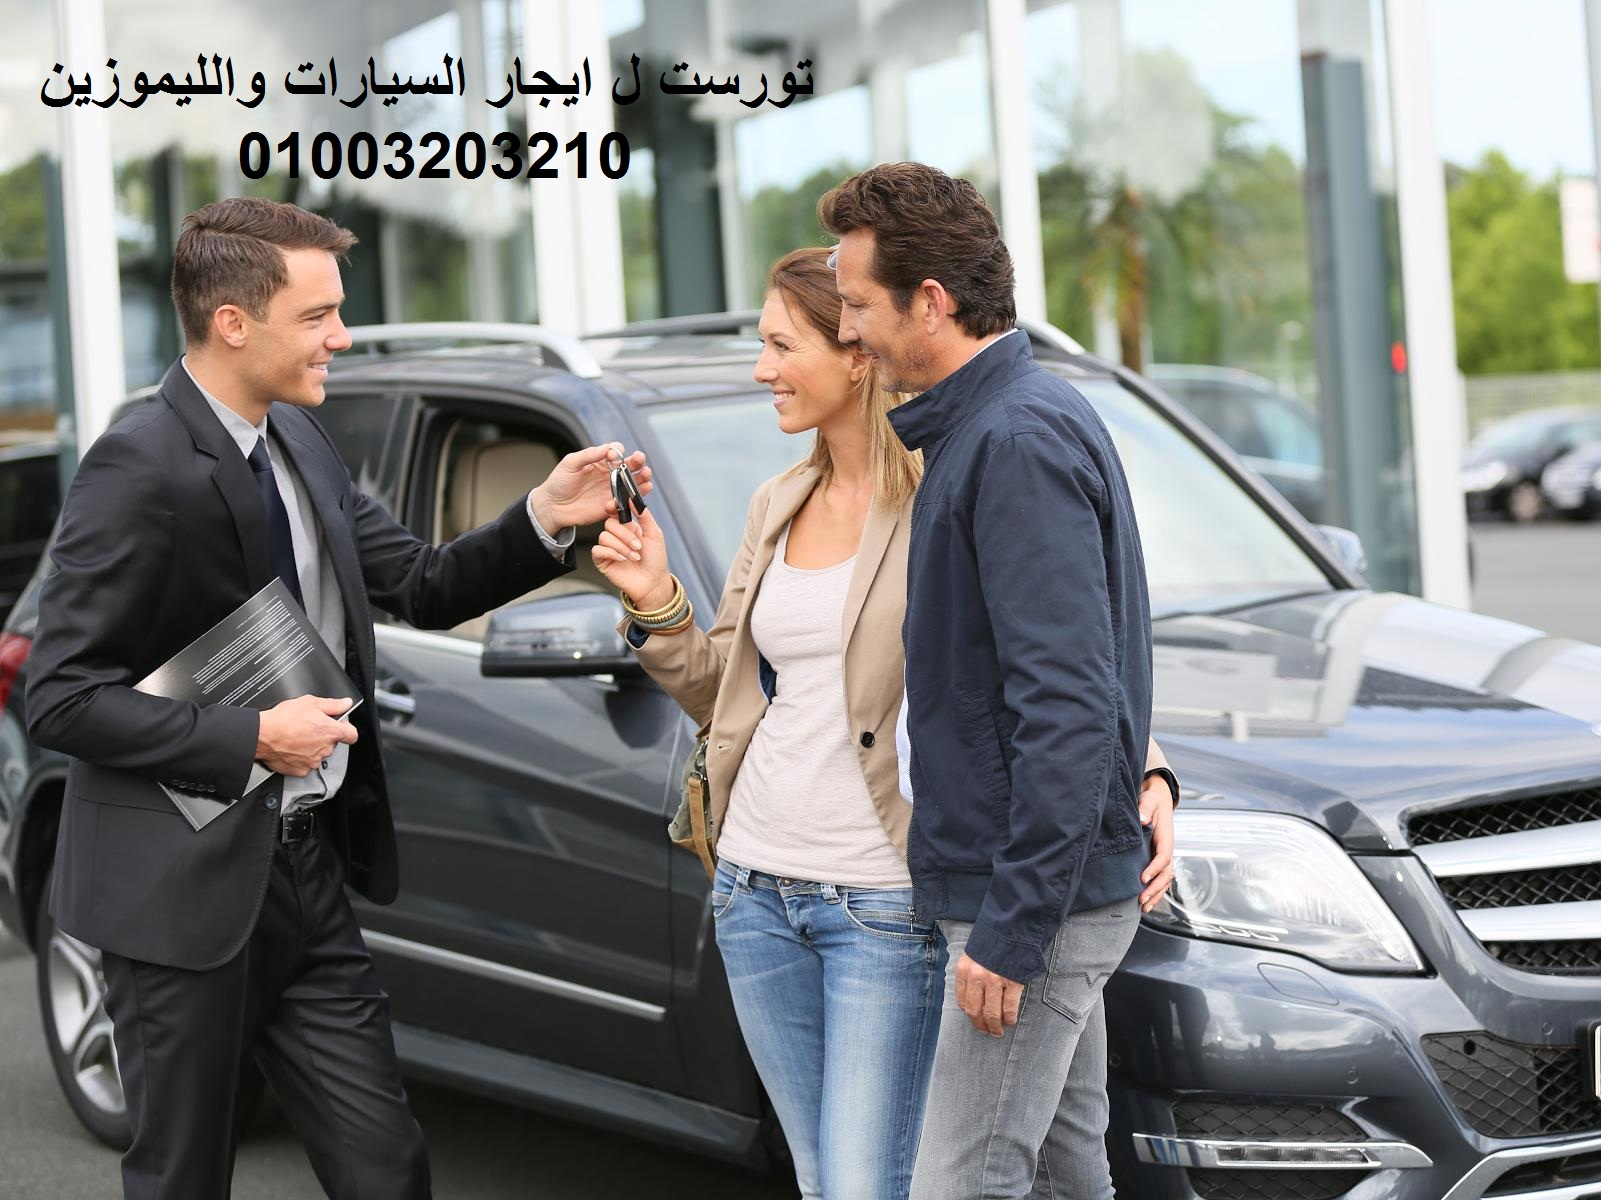 ايجار سيارات مدينه نصر